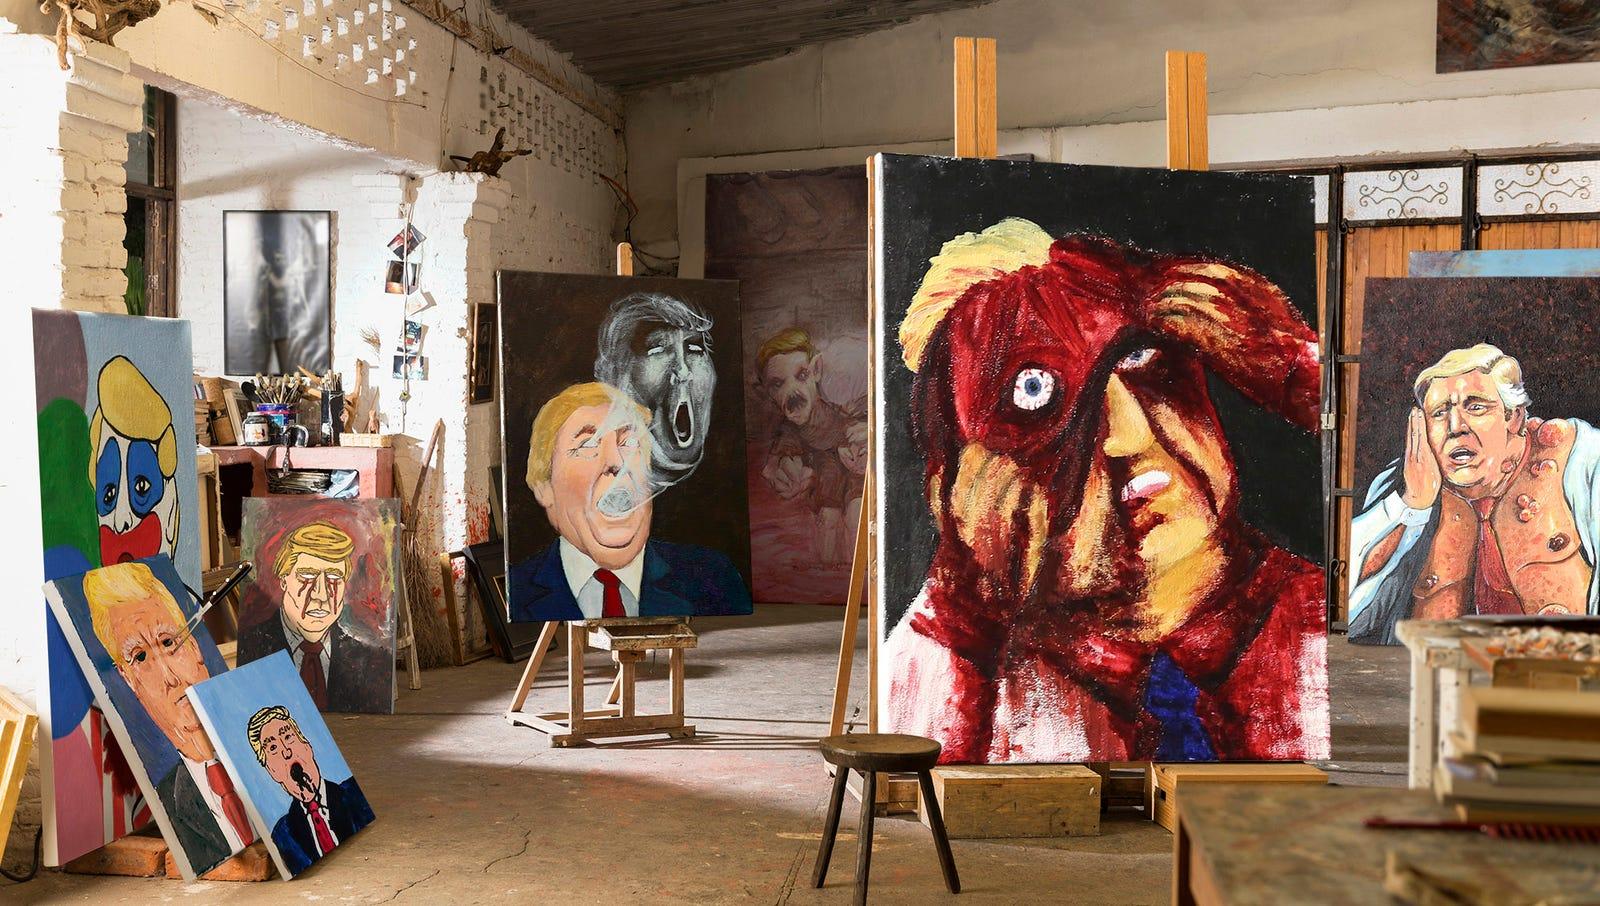 Melania Trump Stumbles Upon Dozens Of Husband's Haunting, Macabre Self-Portraits